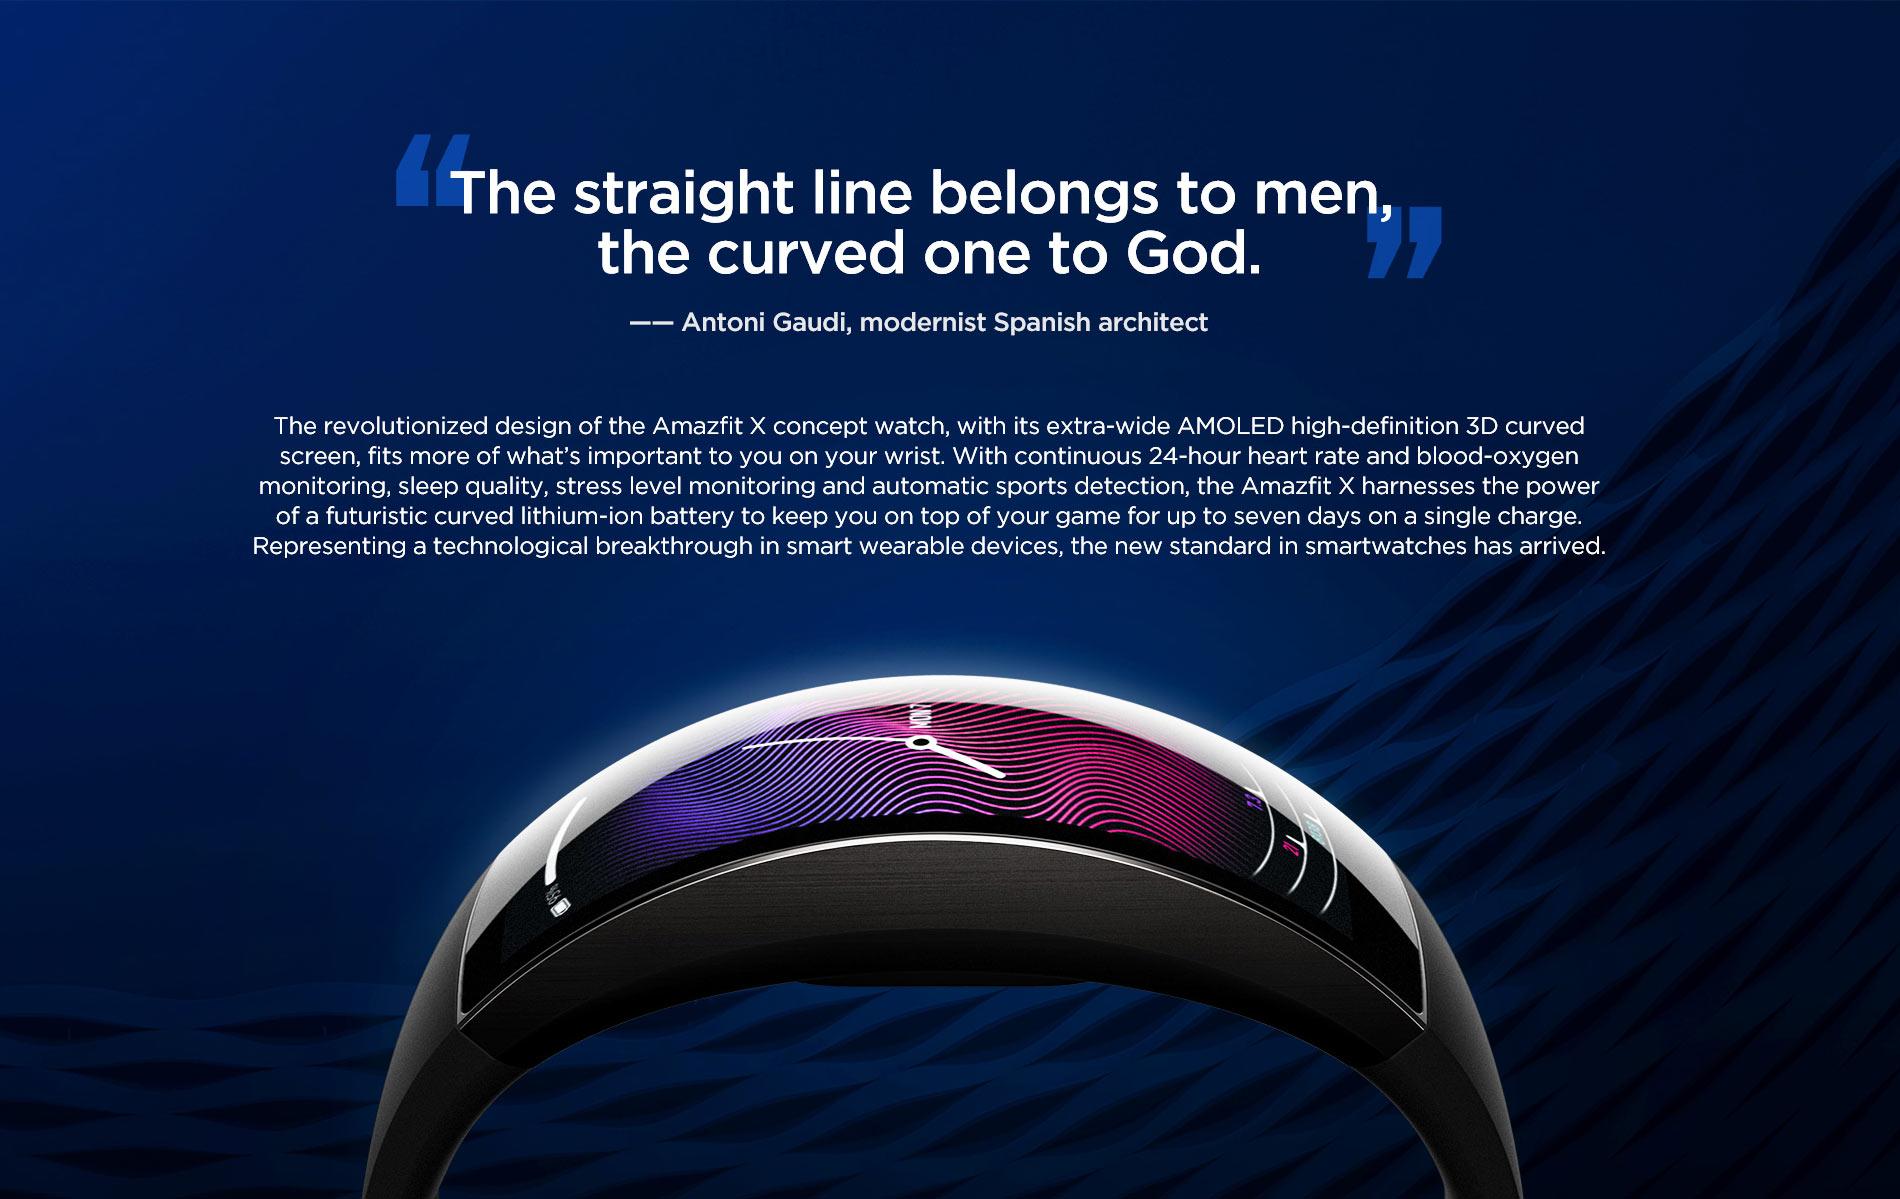 Amazfit X Curved Smartwatch 10